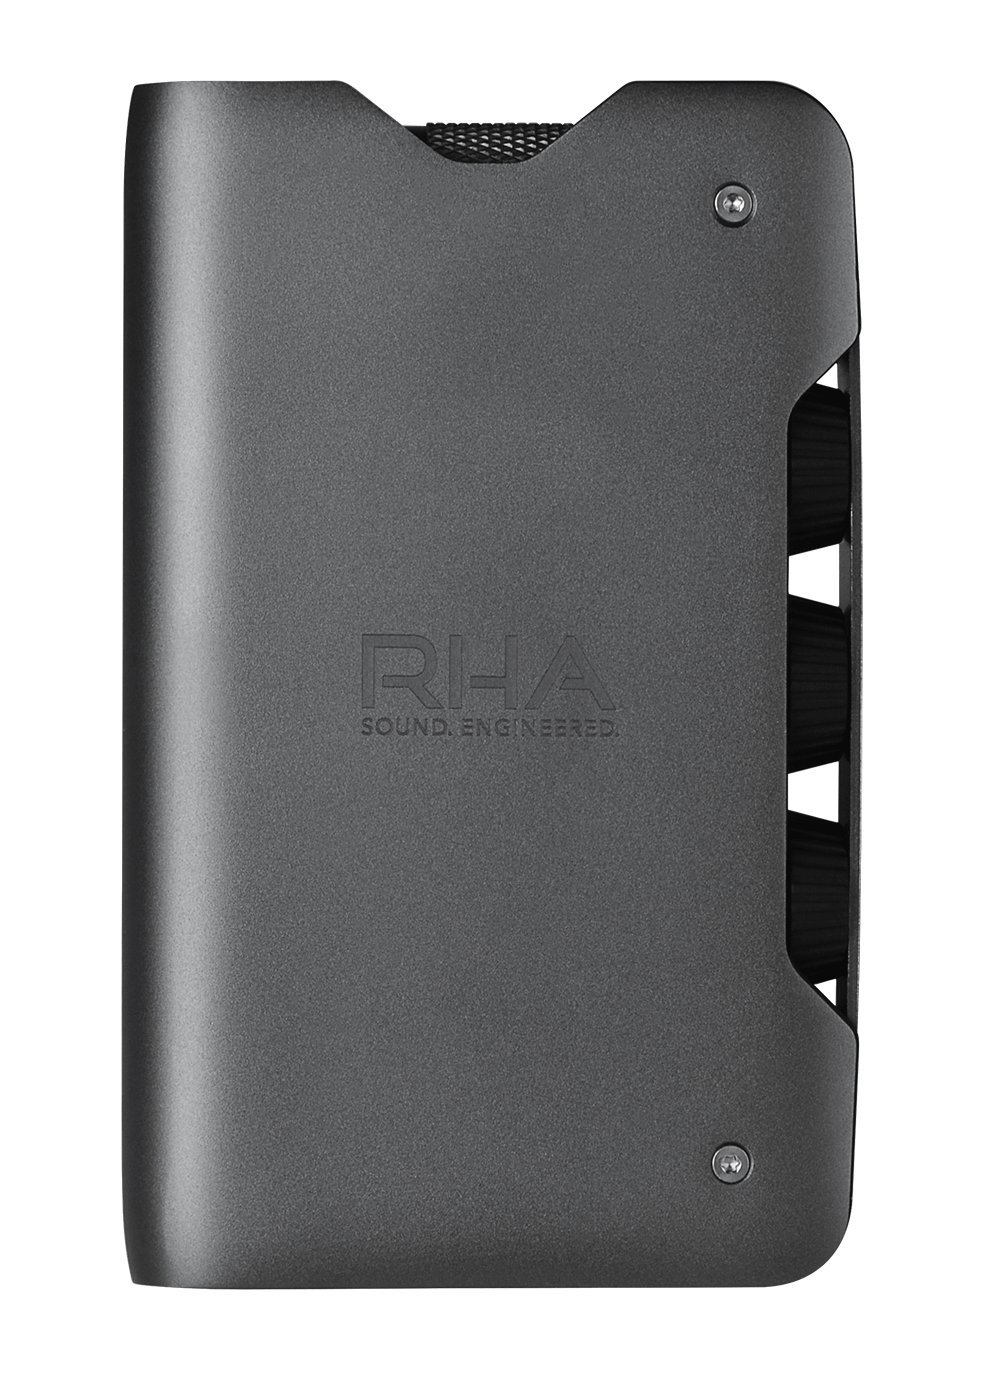 RHA Dacamp L1: Portable Headphone Amplifier & DAC Hi Res Audio with Dedicated Channel Processors